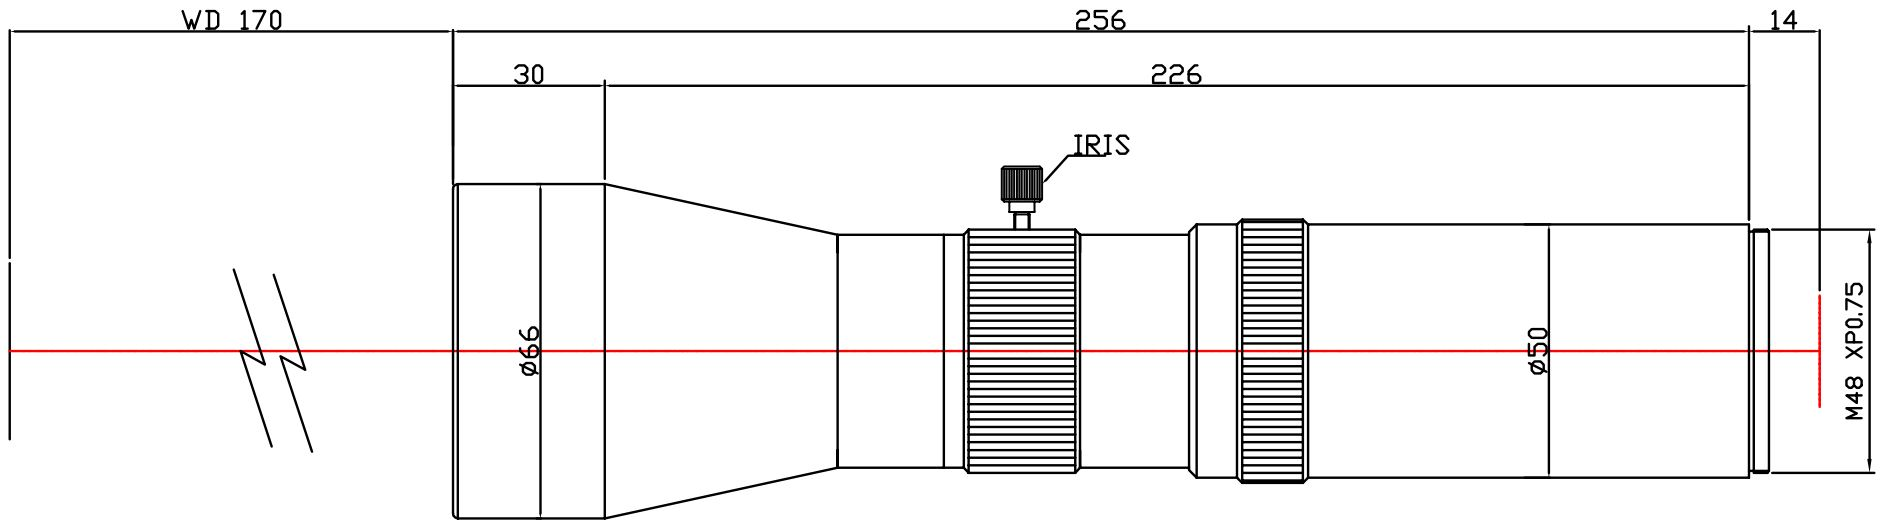 Lensagon T25M-092-170I